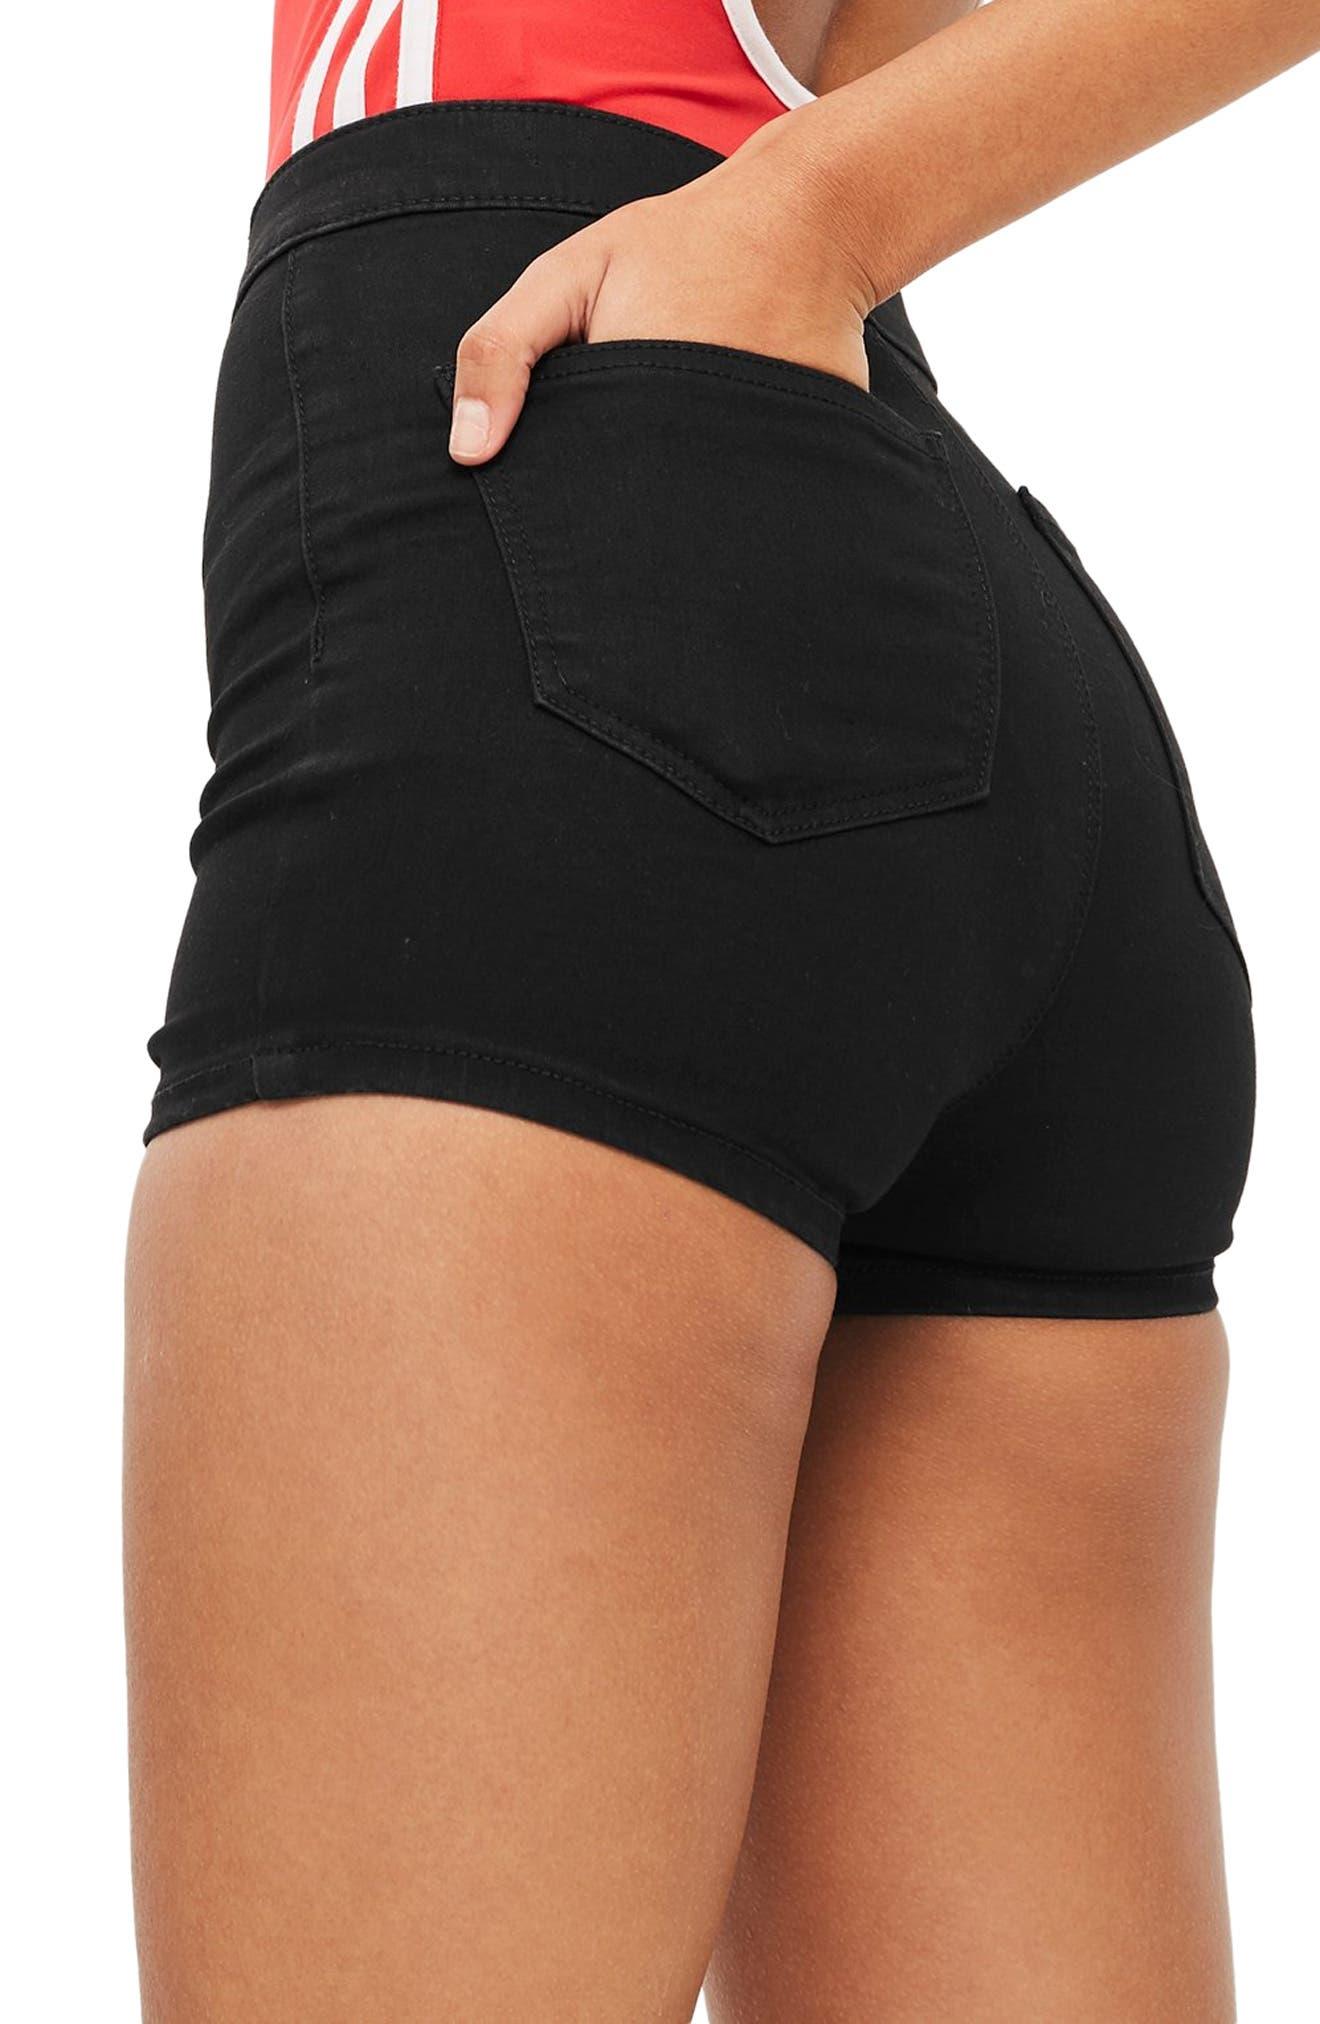 TOPSHOP, Joni High Waist Denim Shorts, Alternate thumbnail 2, color, BLACK